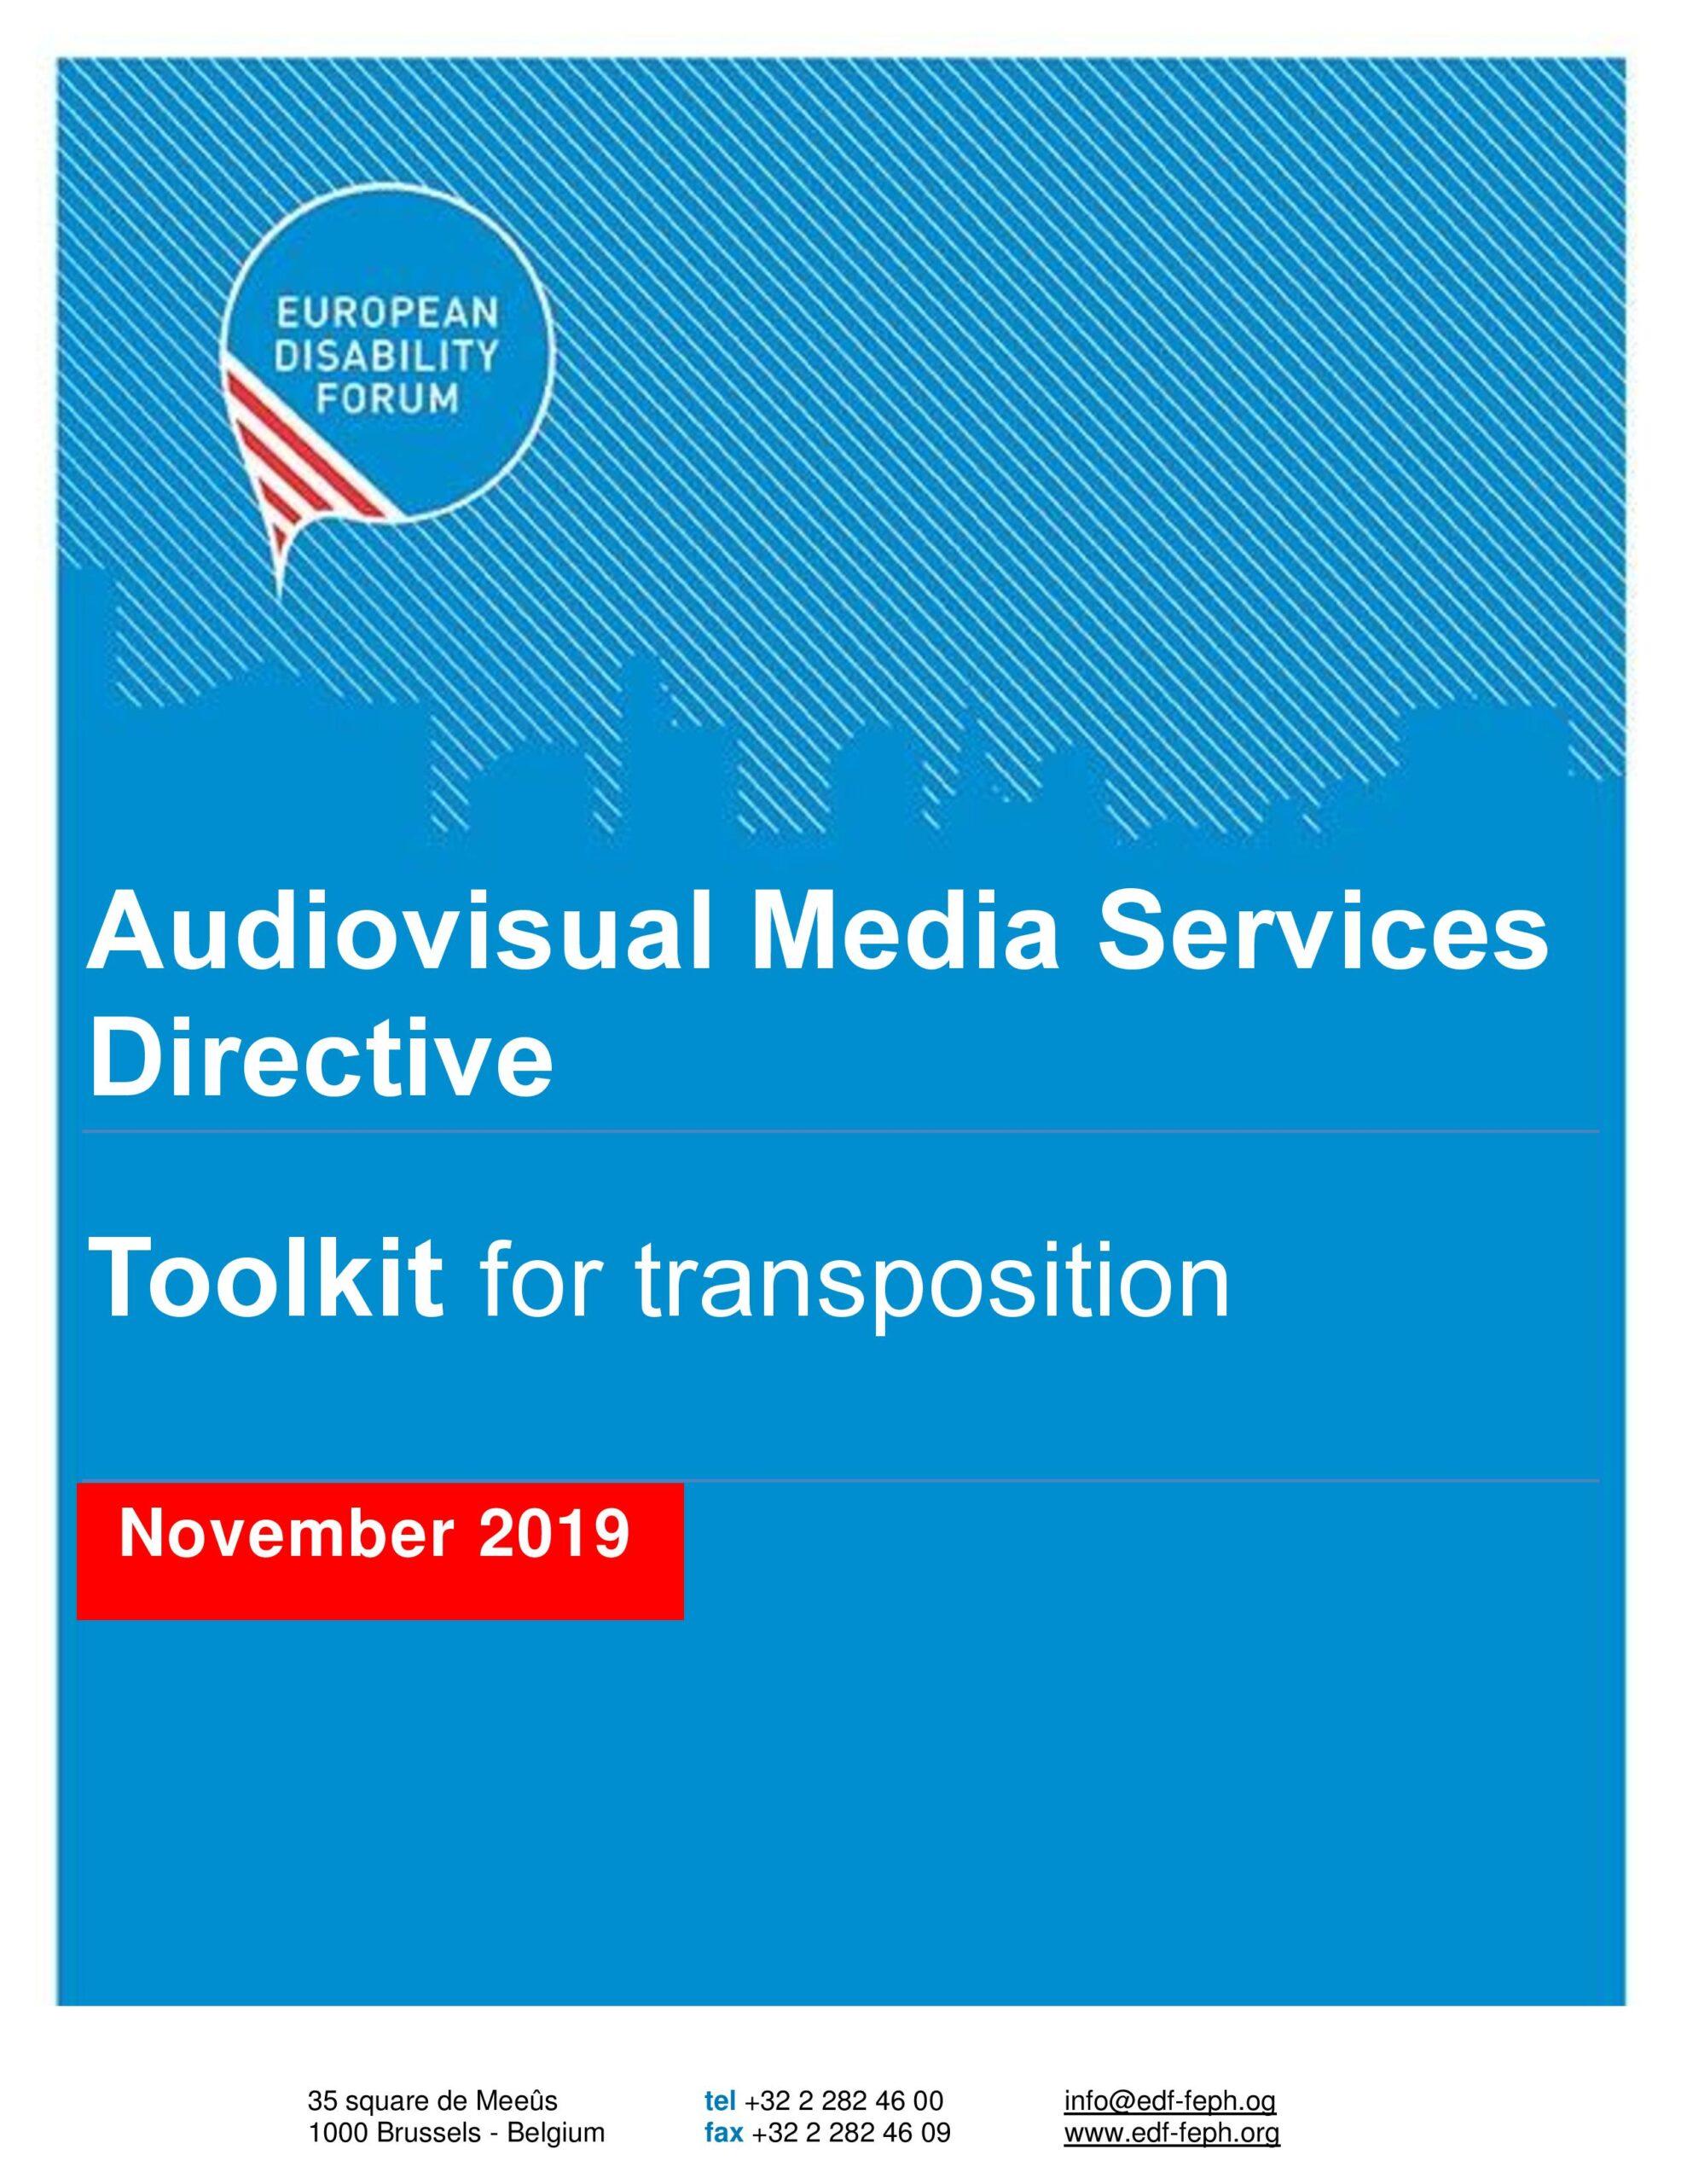 EDF Toolkit 2019 | Audiovisual Media Services Directive